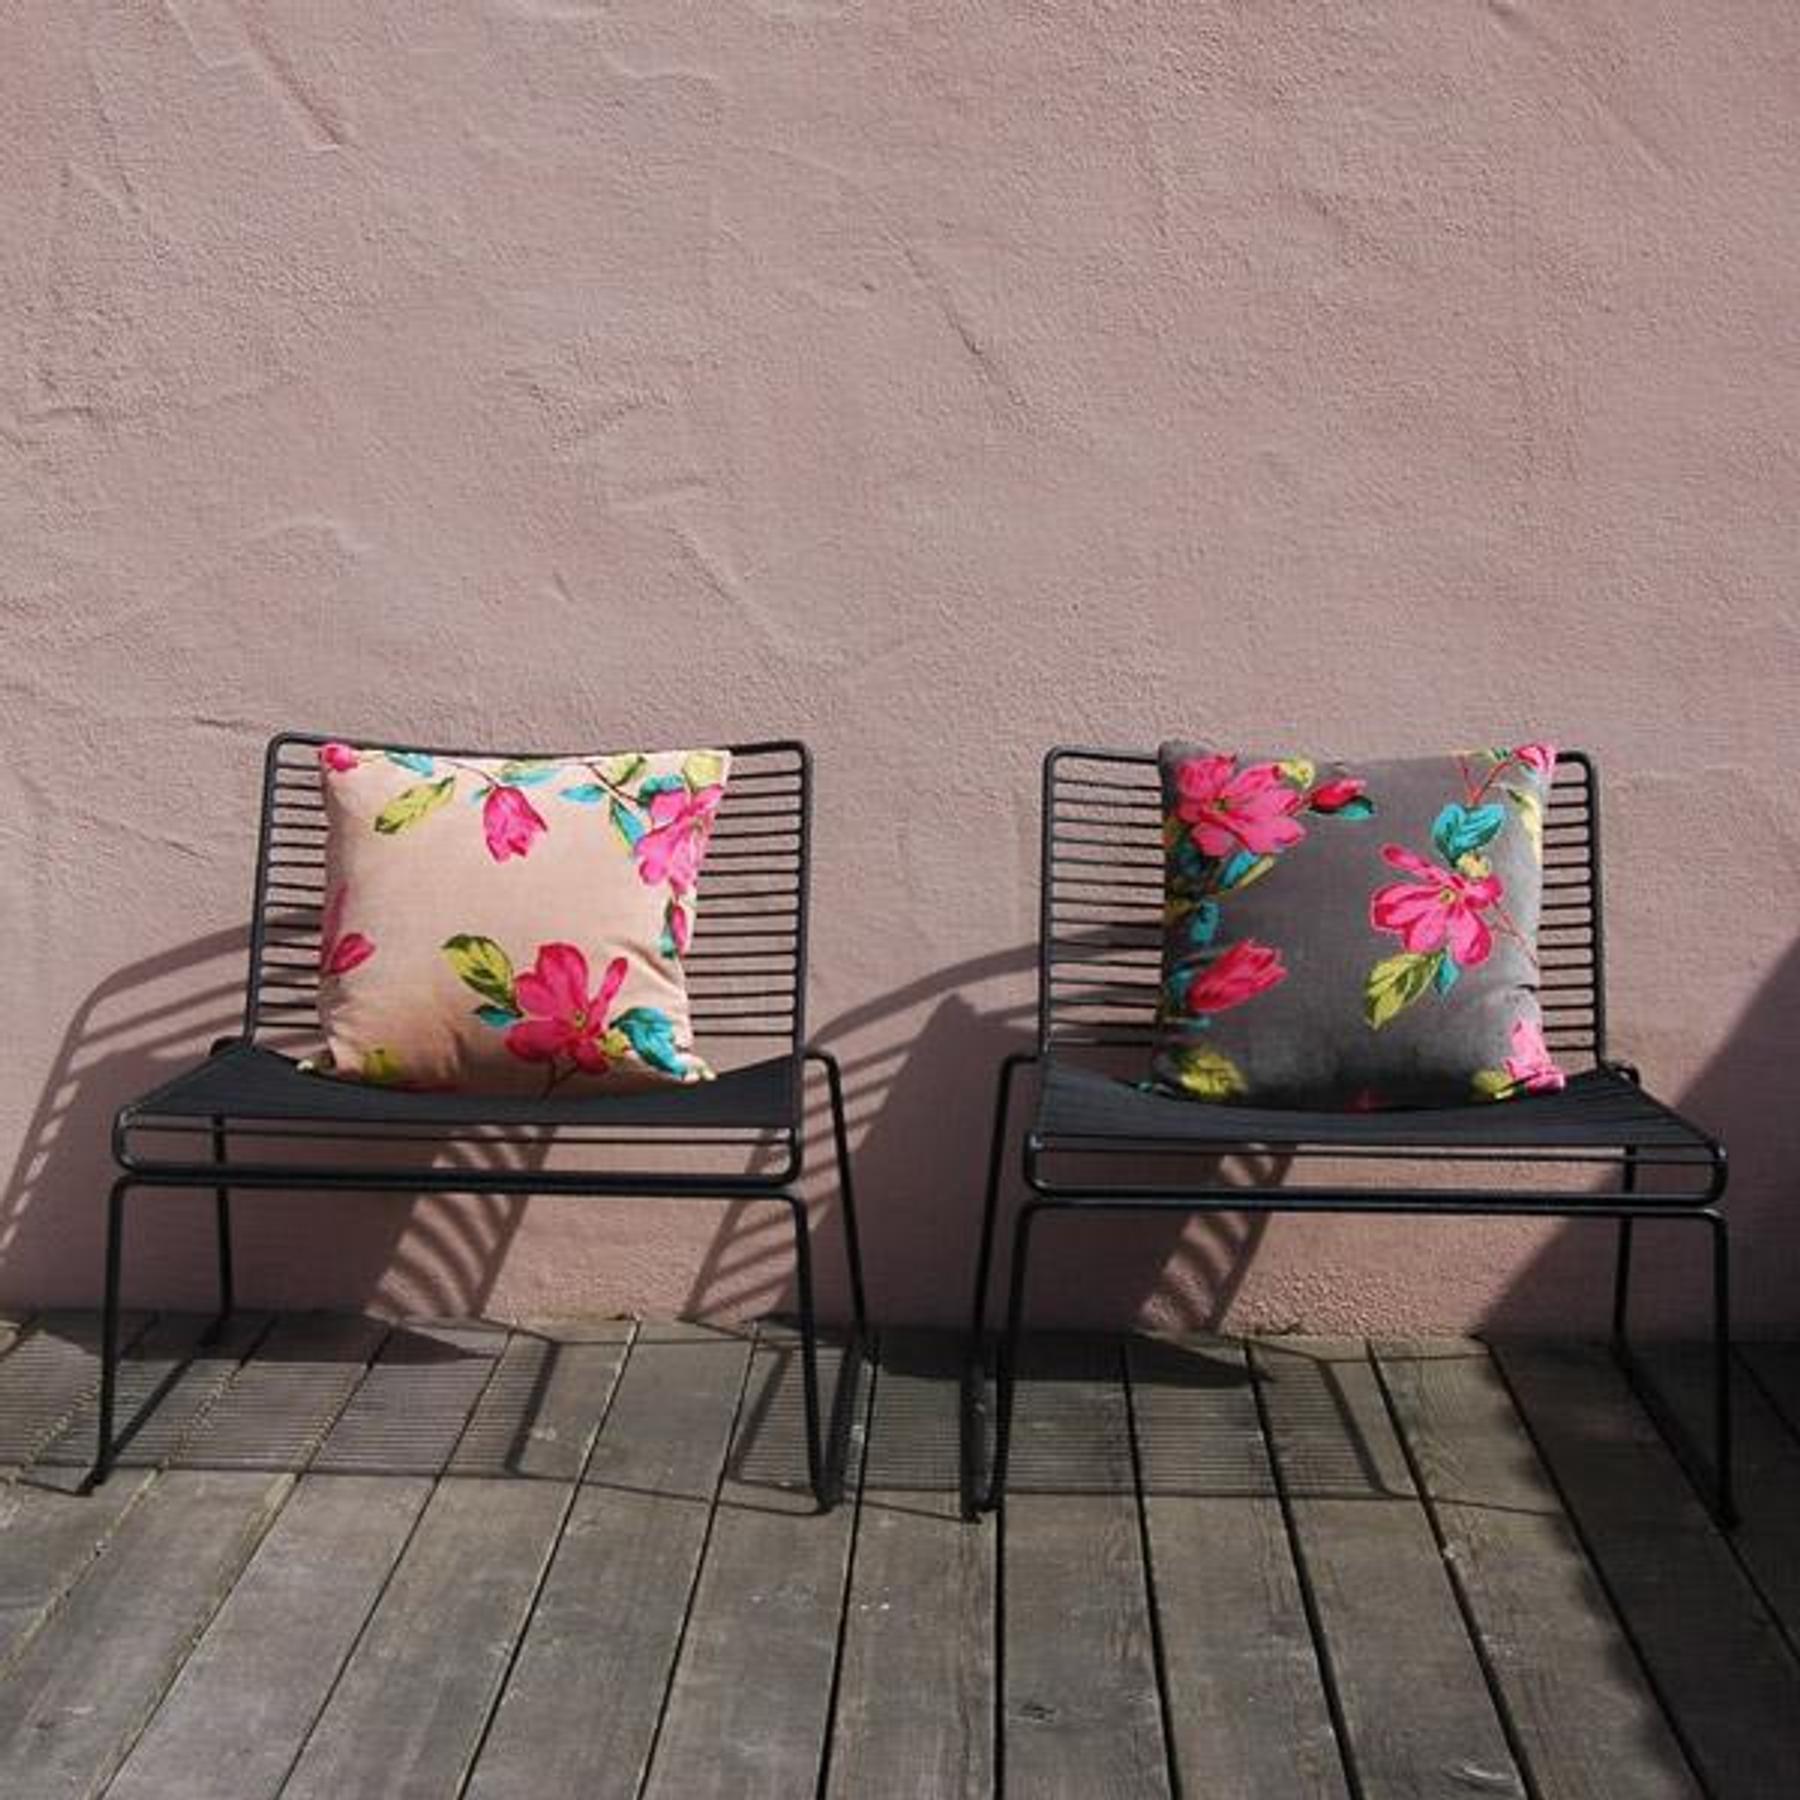 imbarro kissen magnolia grau sofakissen aus baumwolle in 45x45 cm tujuh sch ne dinge. Black Bedroom Furniture Sets. Home Design Ideas